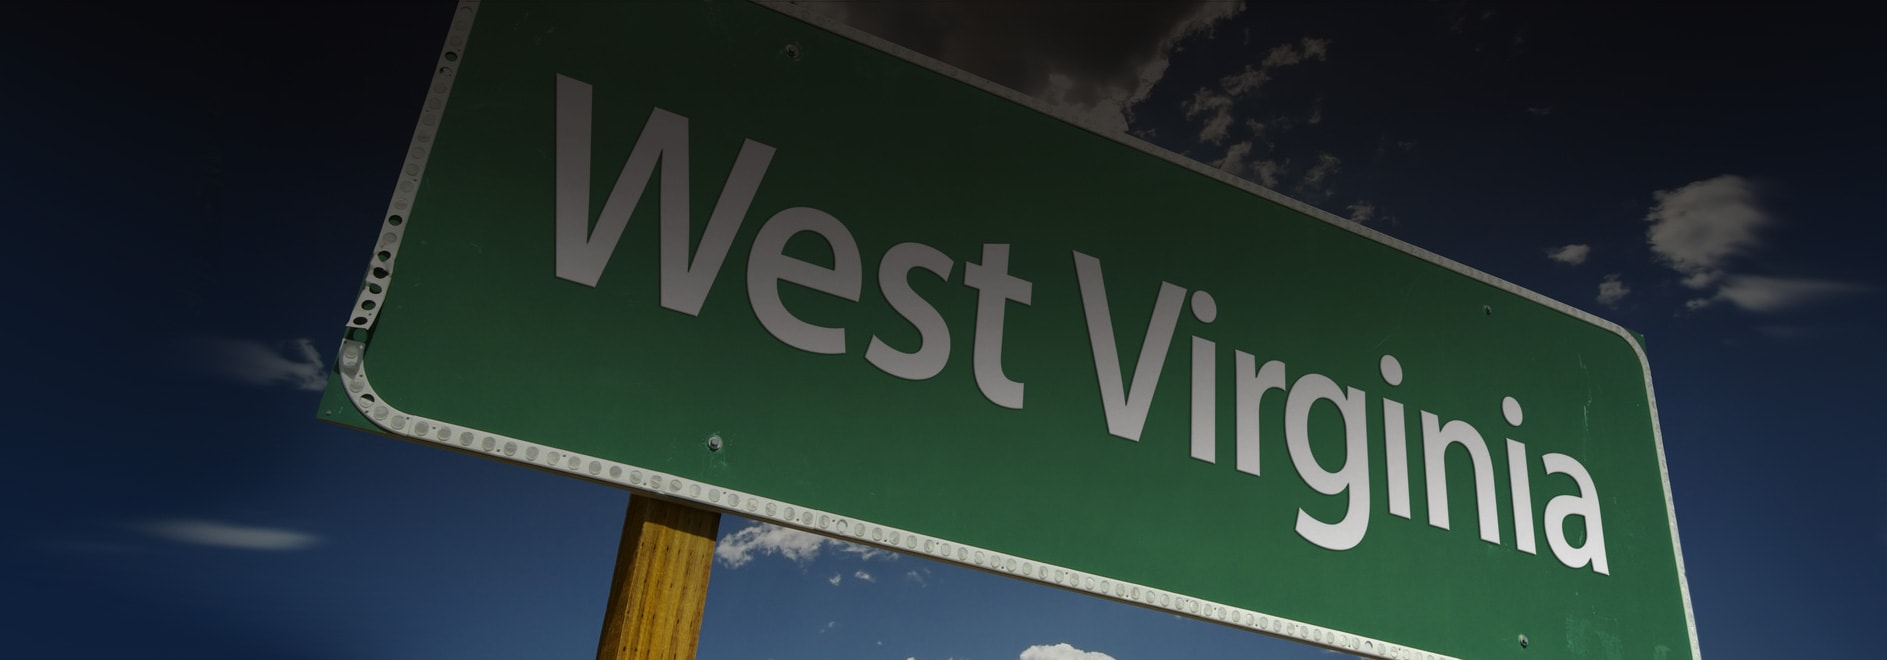 Web Design Martinsburg West Virginia